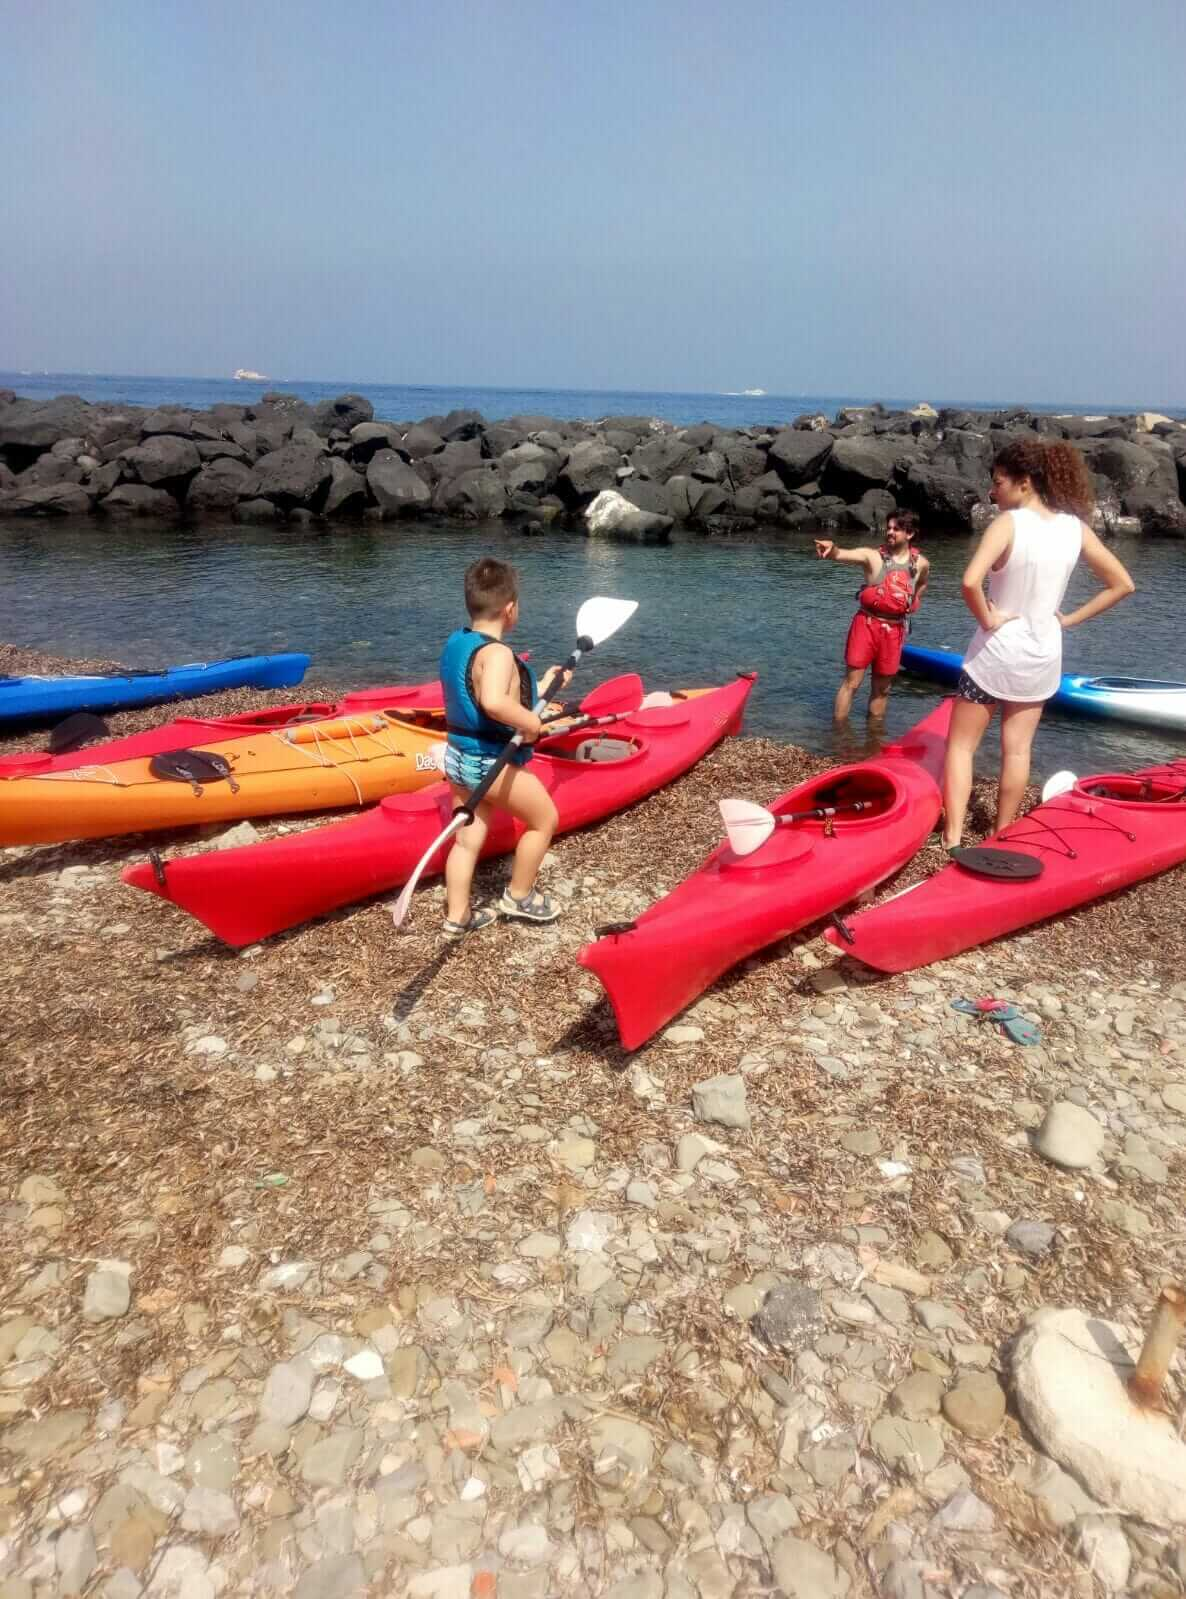 massa lubrense, sorrento, amalfi, mare, kayak